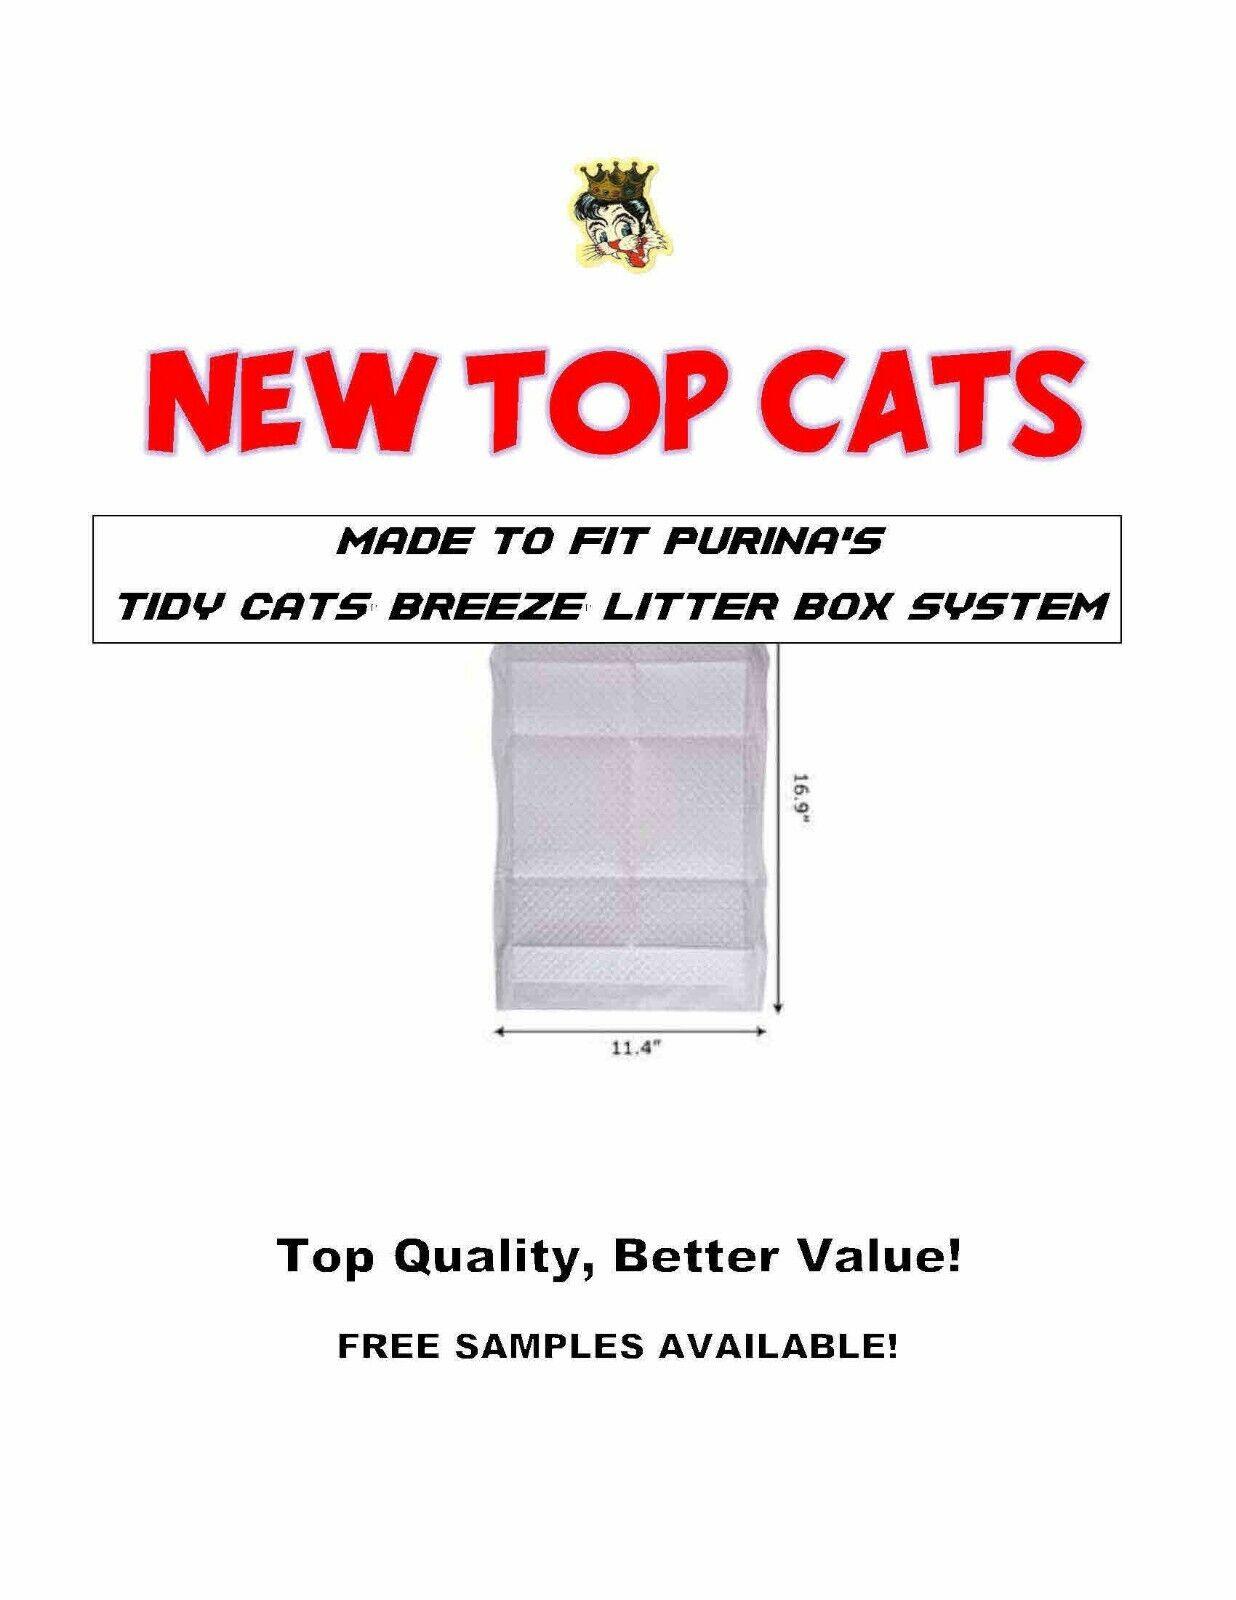 160ct Top Cat CHEAP Litter Box Pads Fits 11.4 x16.9 Name Brand Litter Box Sys.